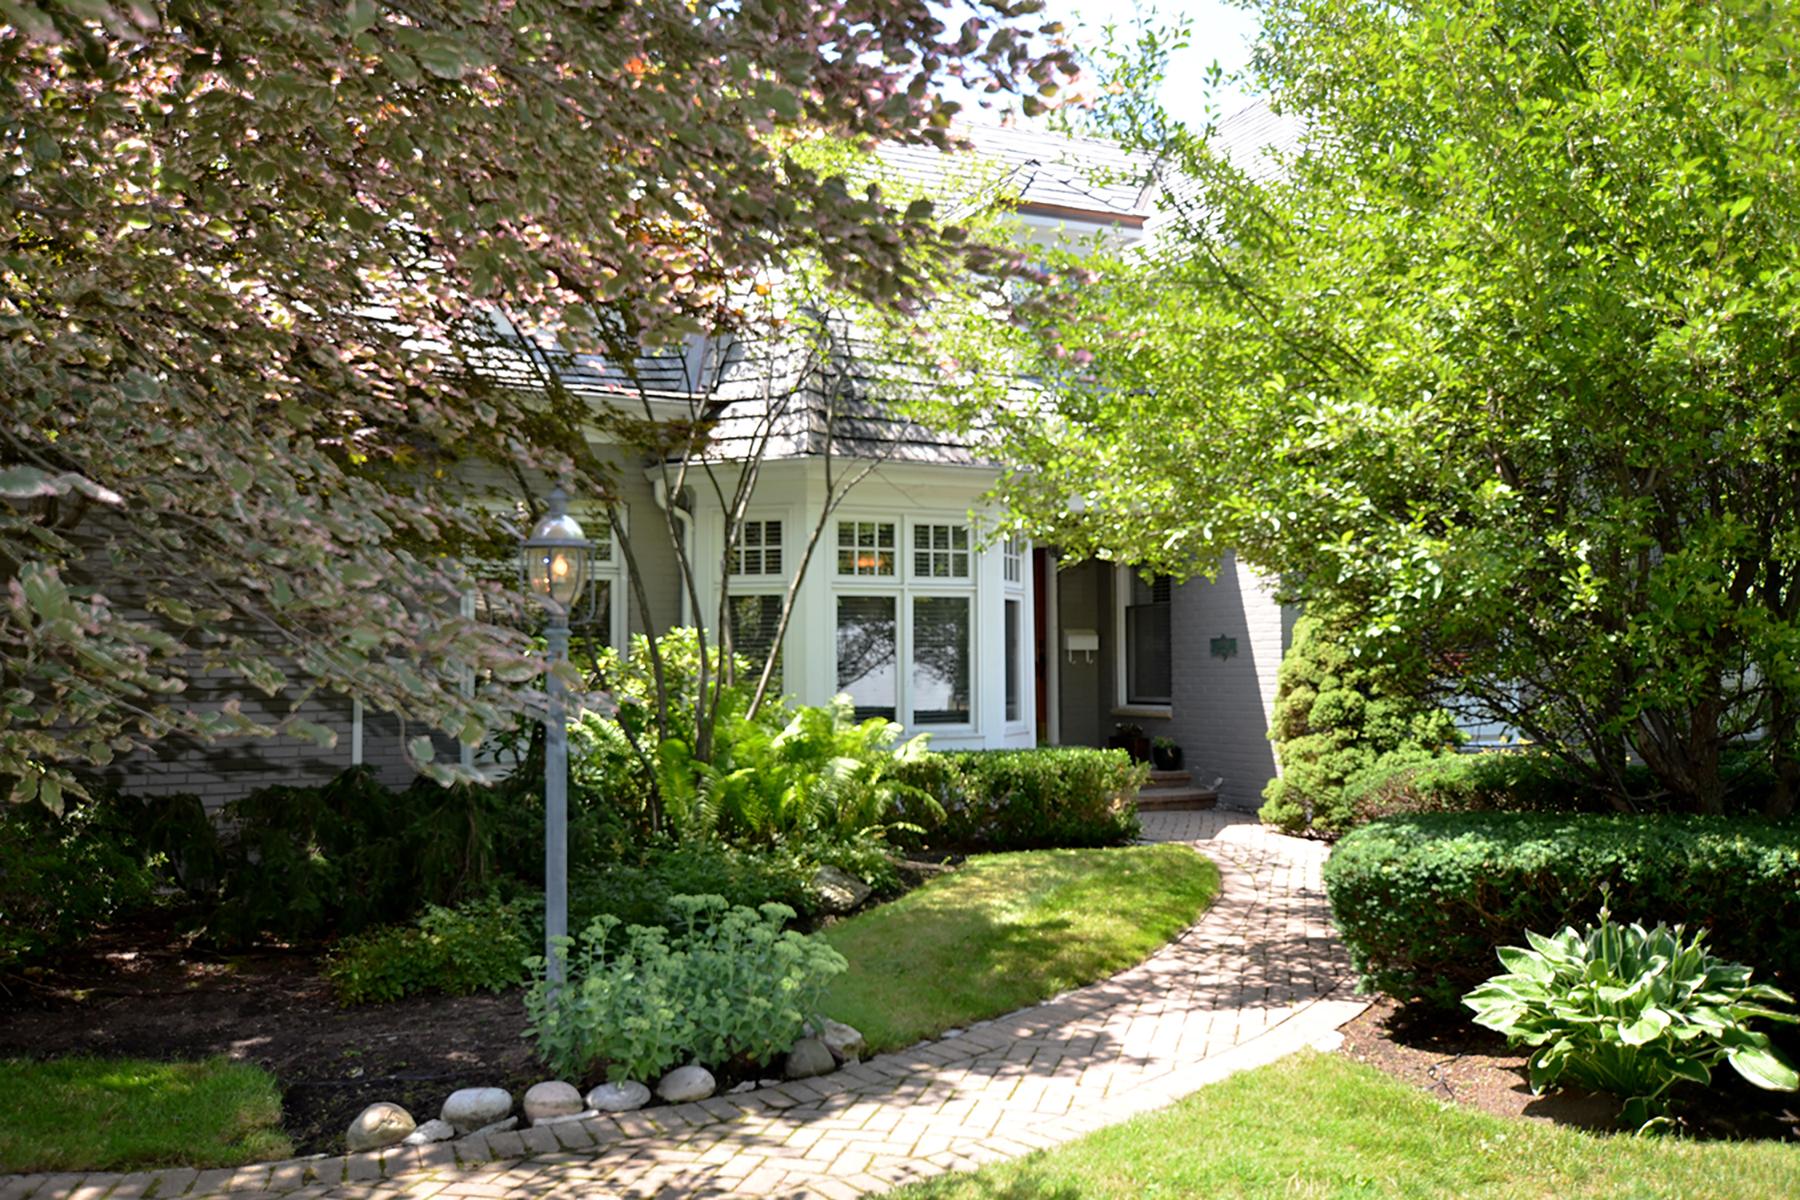 Single Family Home for Sale at Birmingham 1447 Old Salem Ct Birmingham, Michigan, 48009 United States